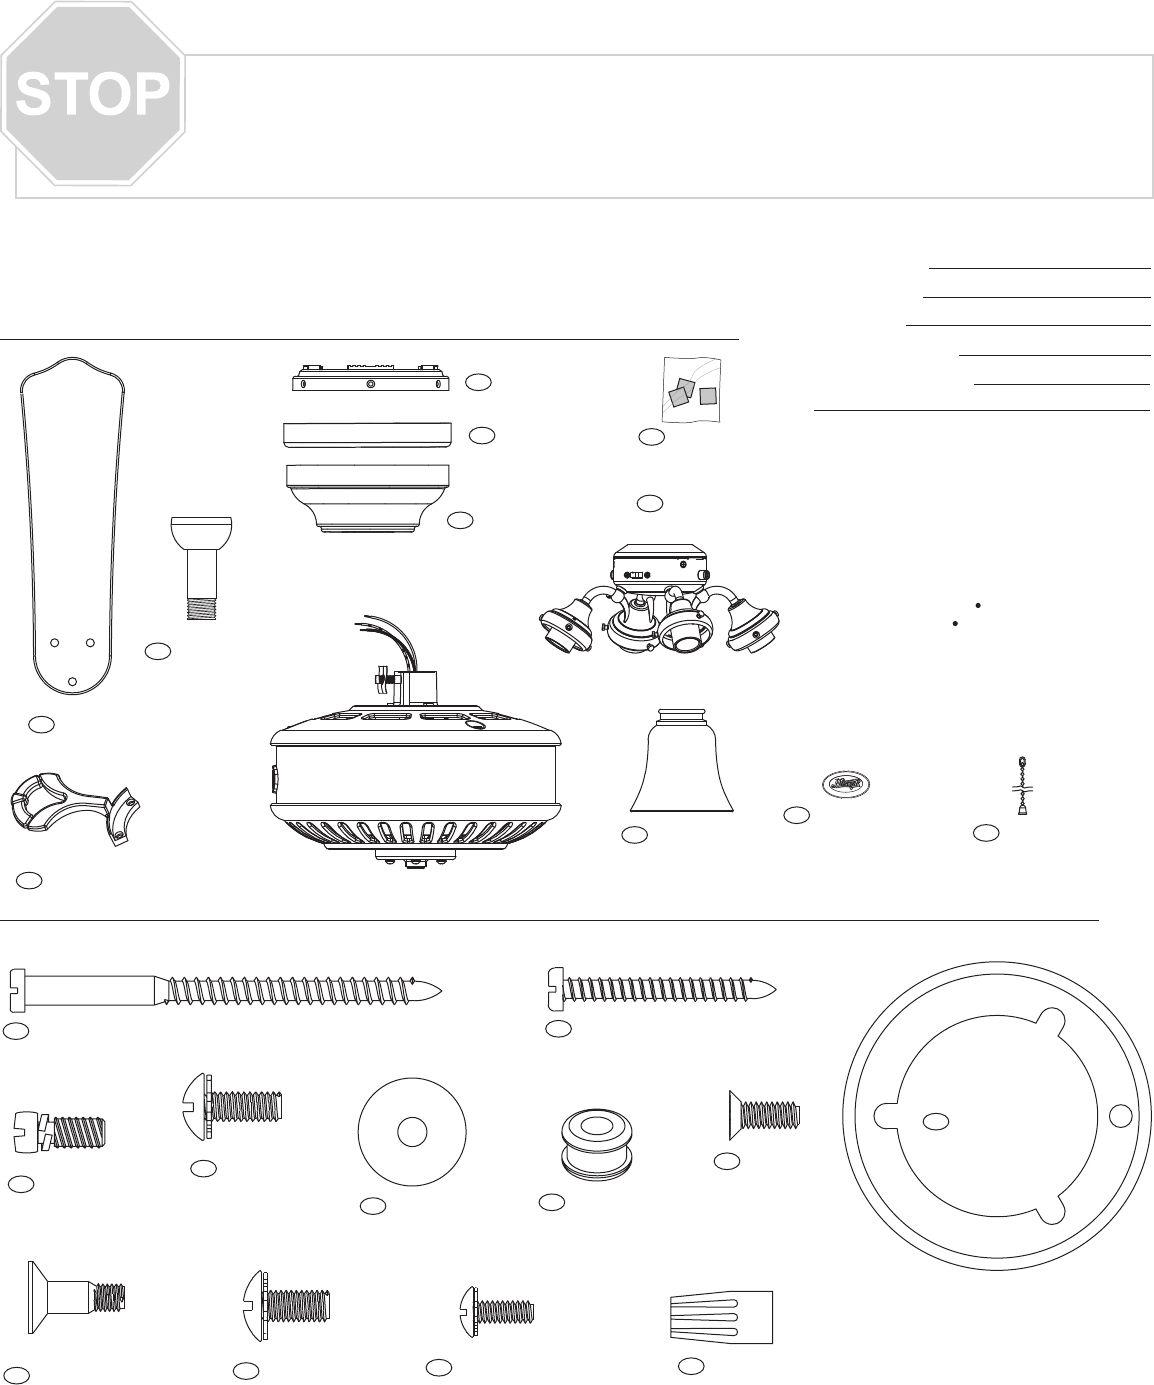 Thermostat 44360 Wiring Diagram And Schematics Hunter 44132 Fan Thermostats Cineitalia01 Info Source Ceiling